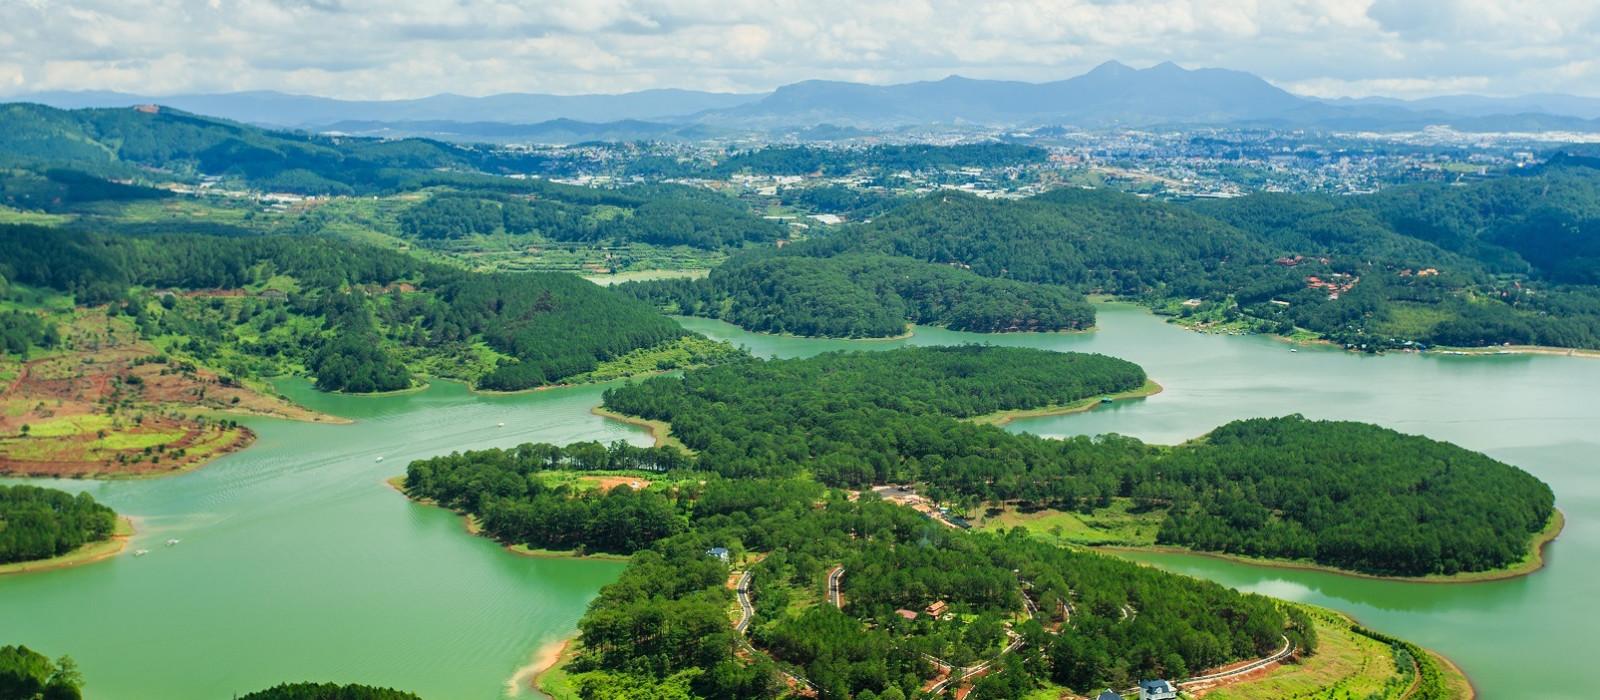 Reiseziel Dalat Vietnam